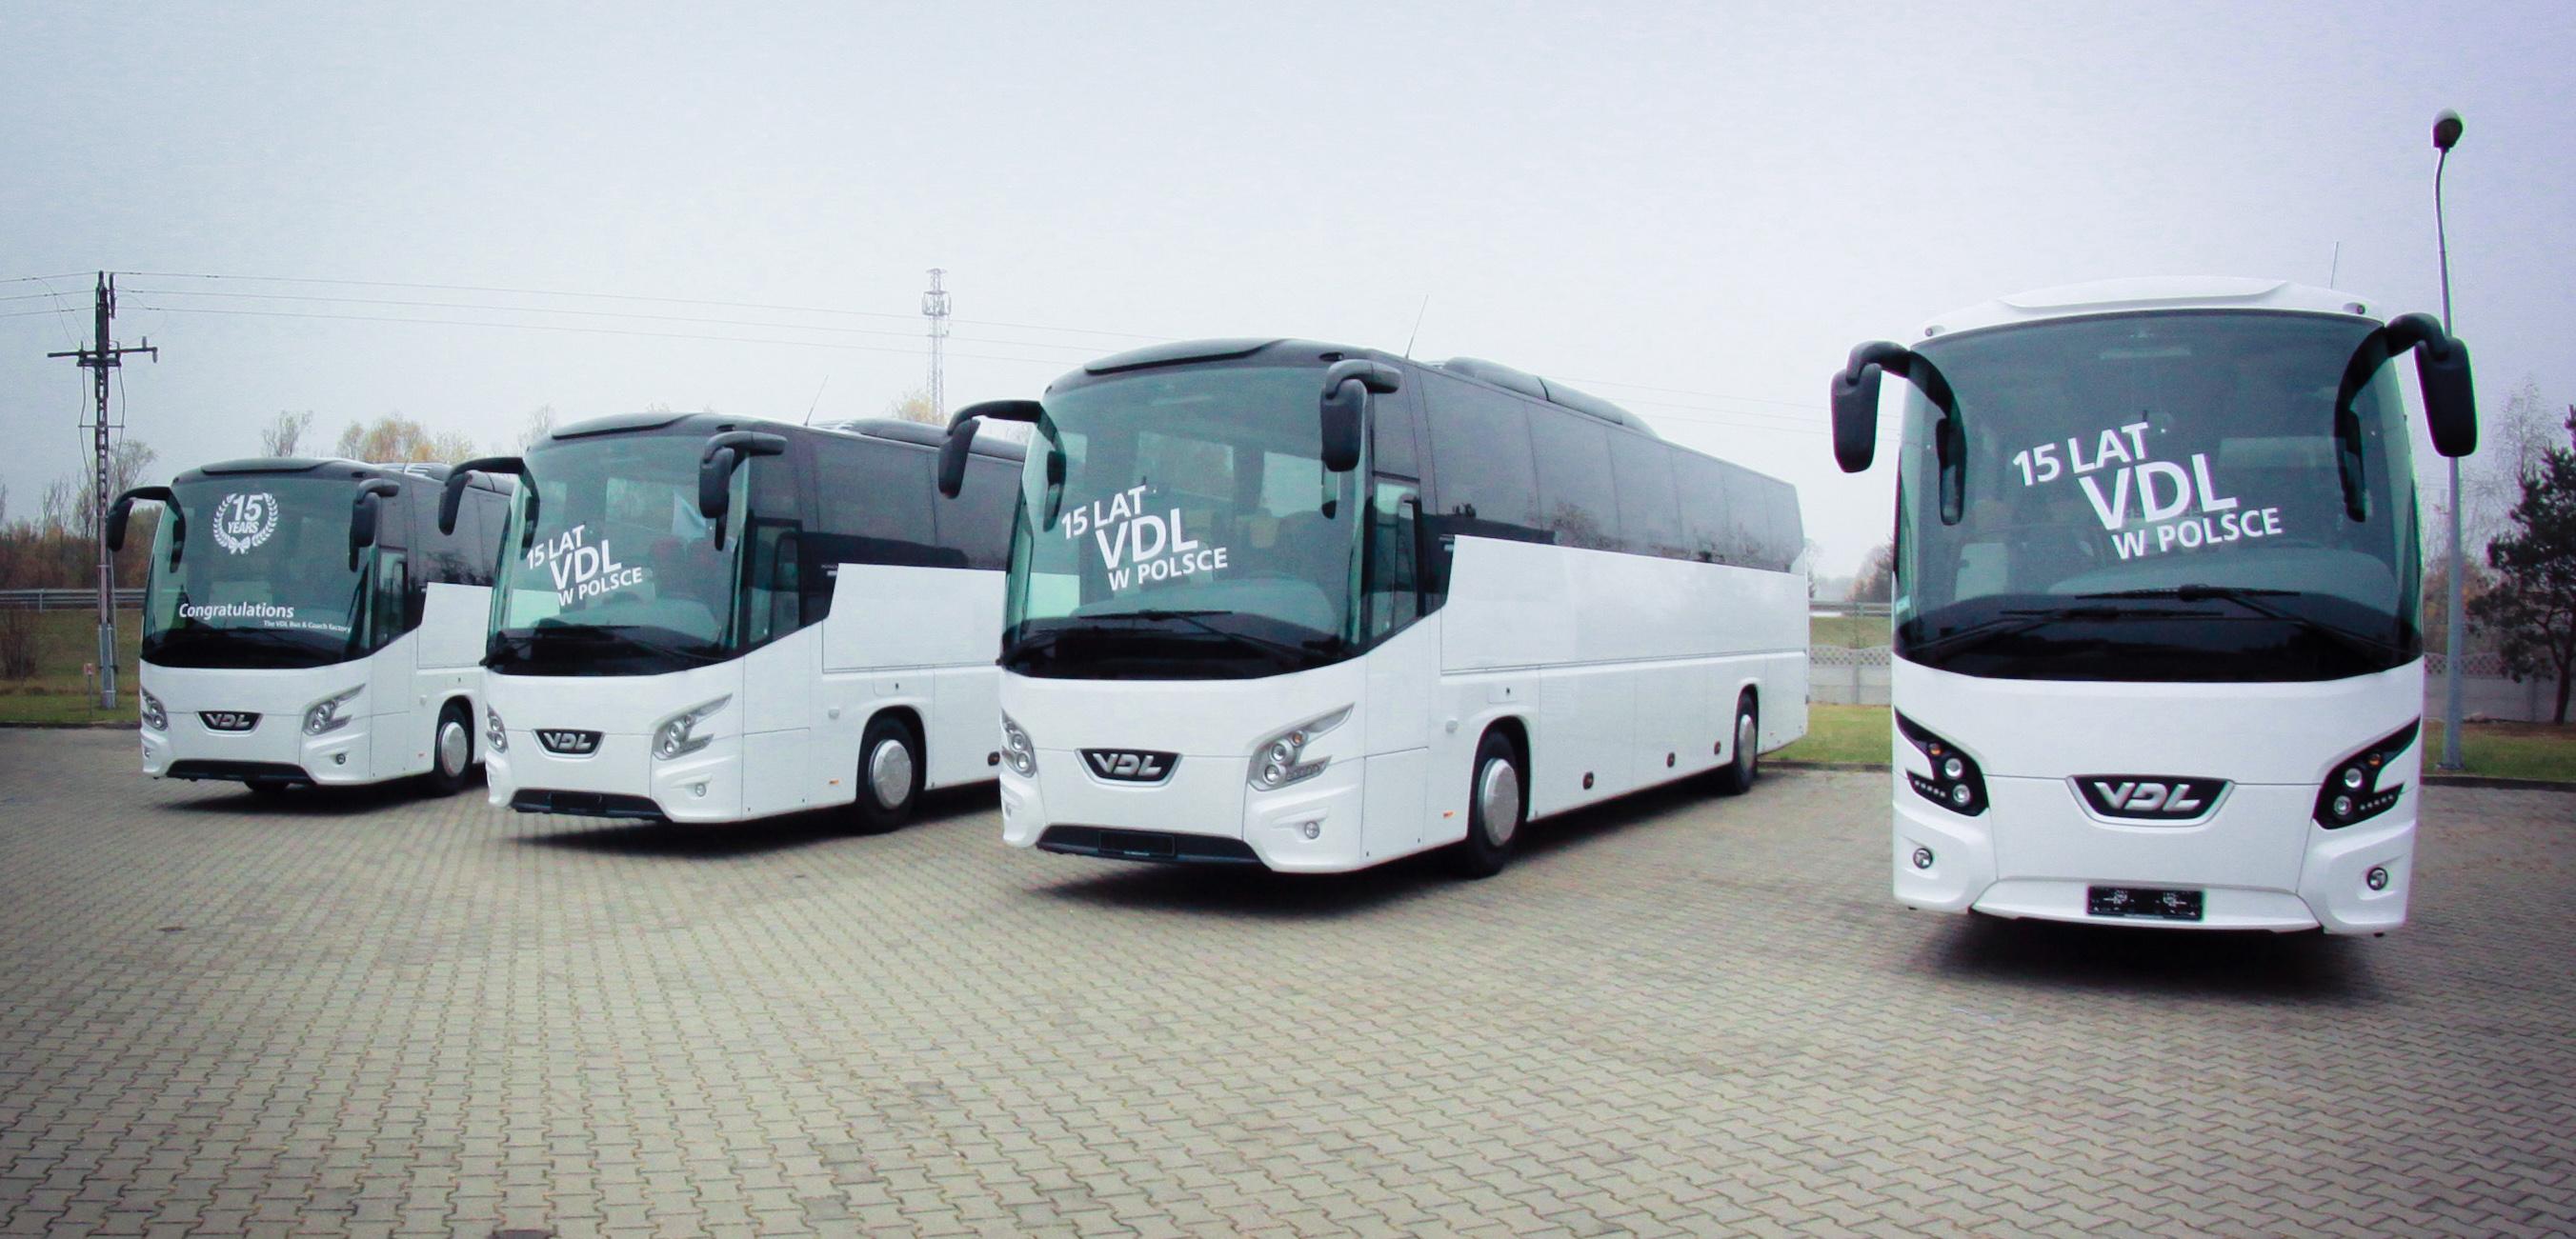 VDL Bus & Coach - VDL Bus & Coach Polska celebrates 15th anniversary